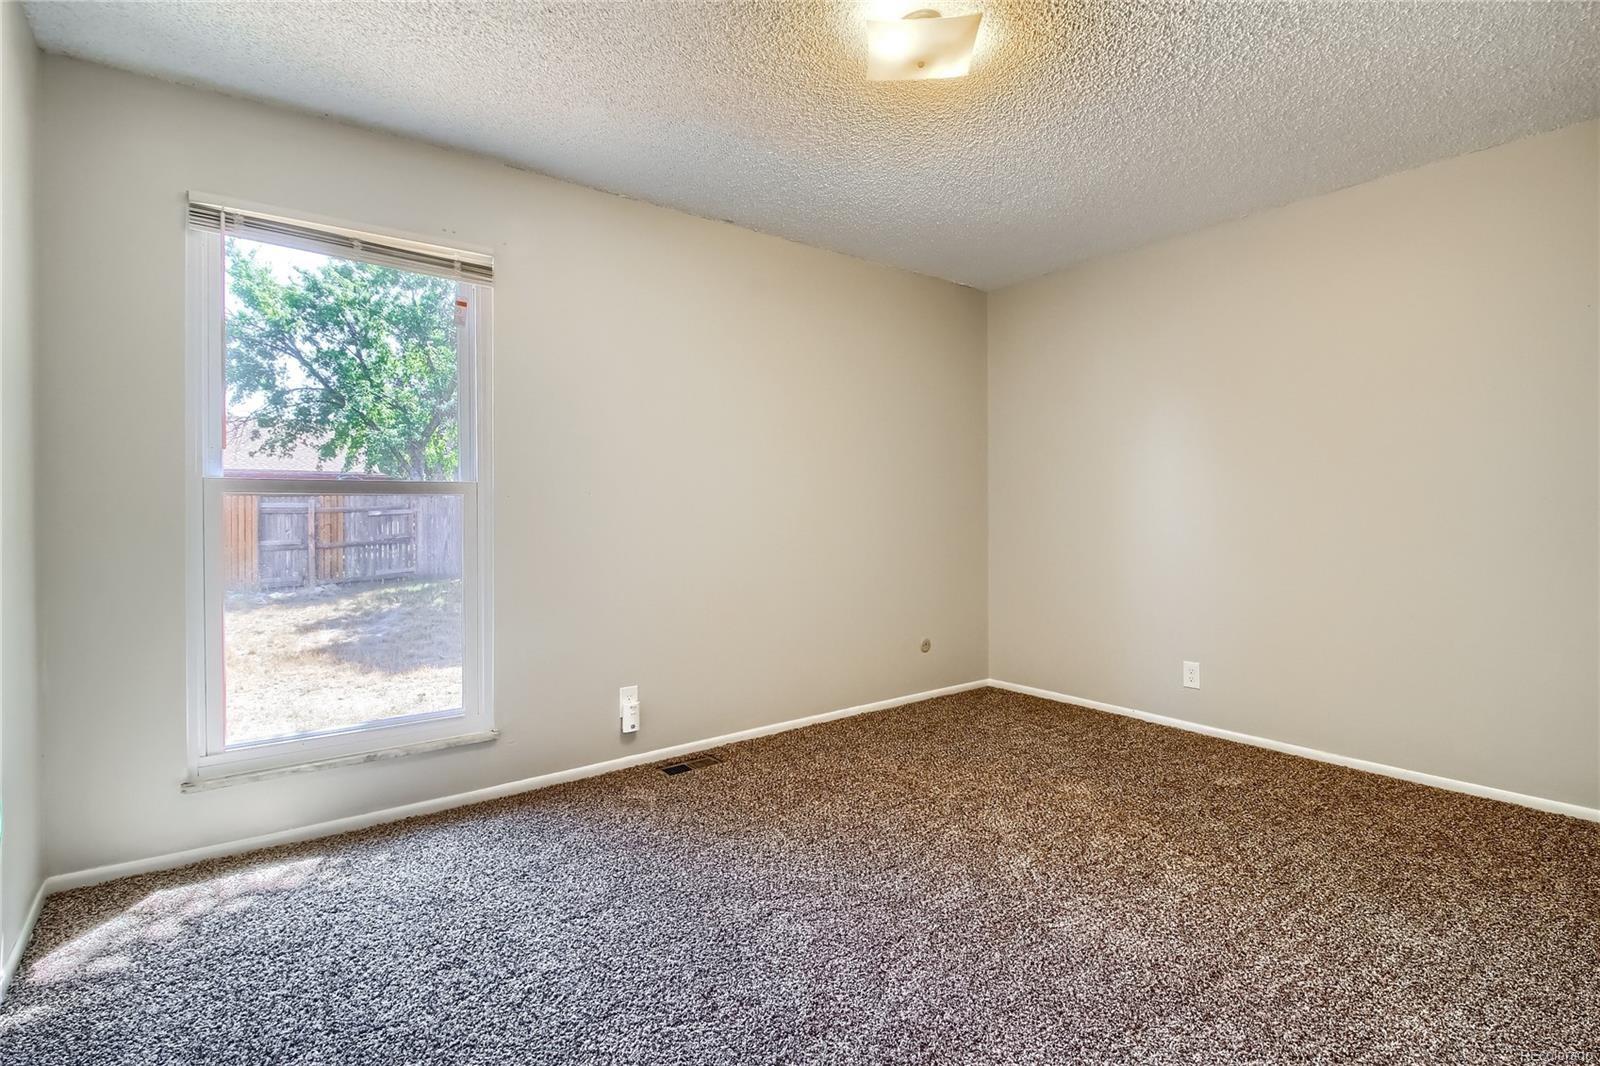 MLS# 4817896 - 24 - 5080 Worchester Street, Denver, CO 80239